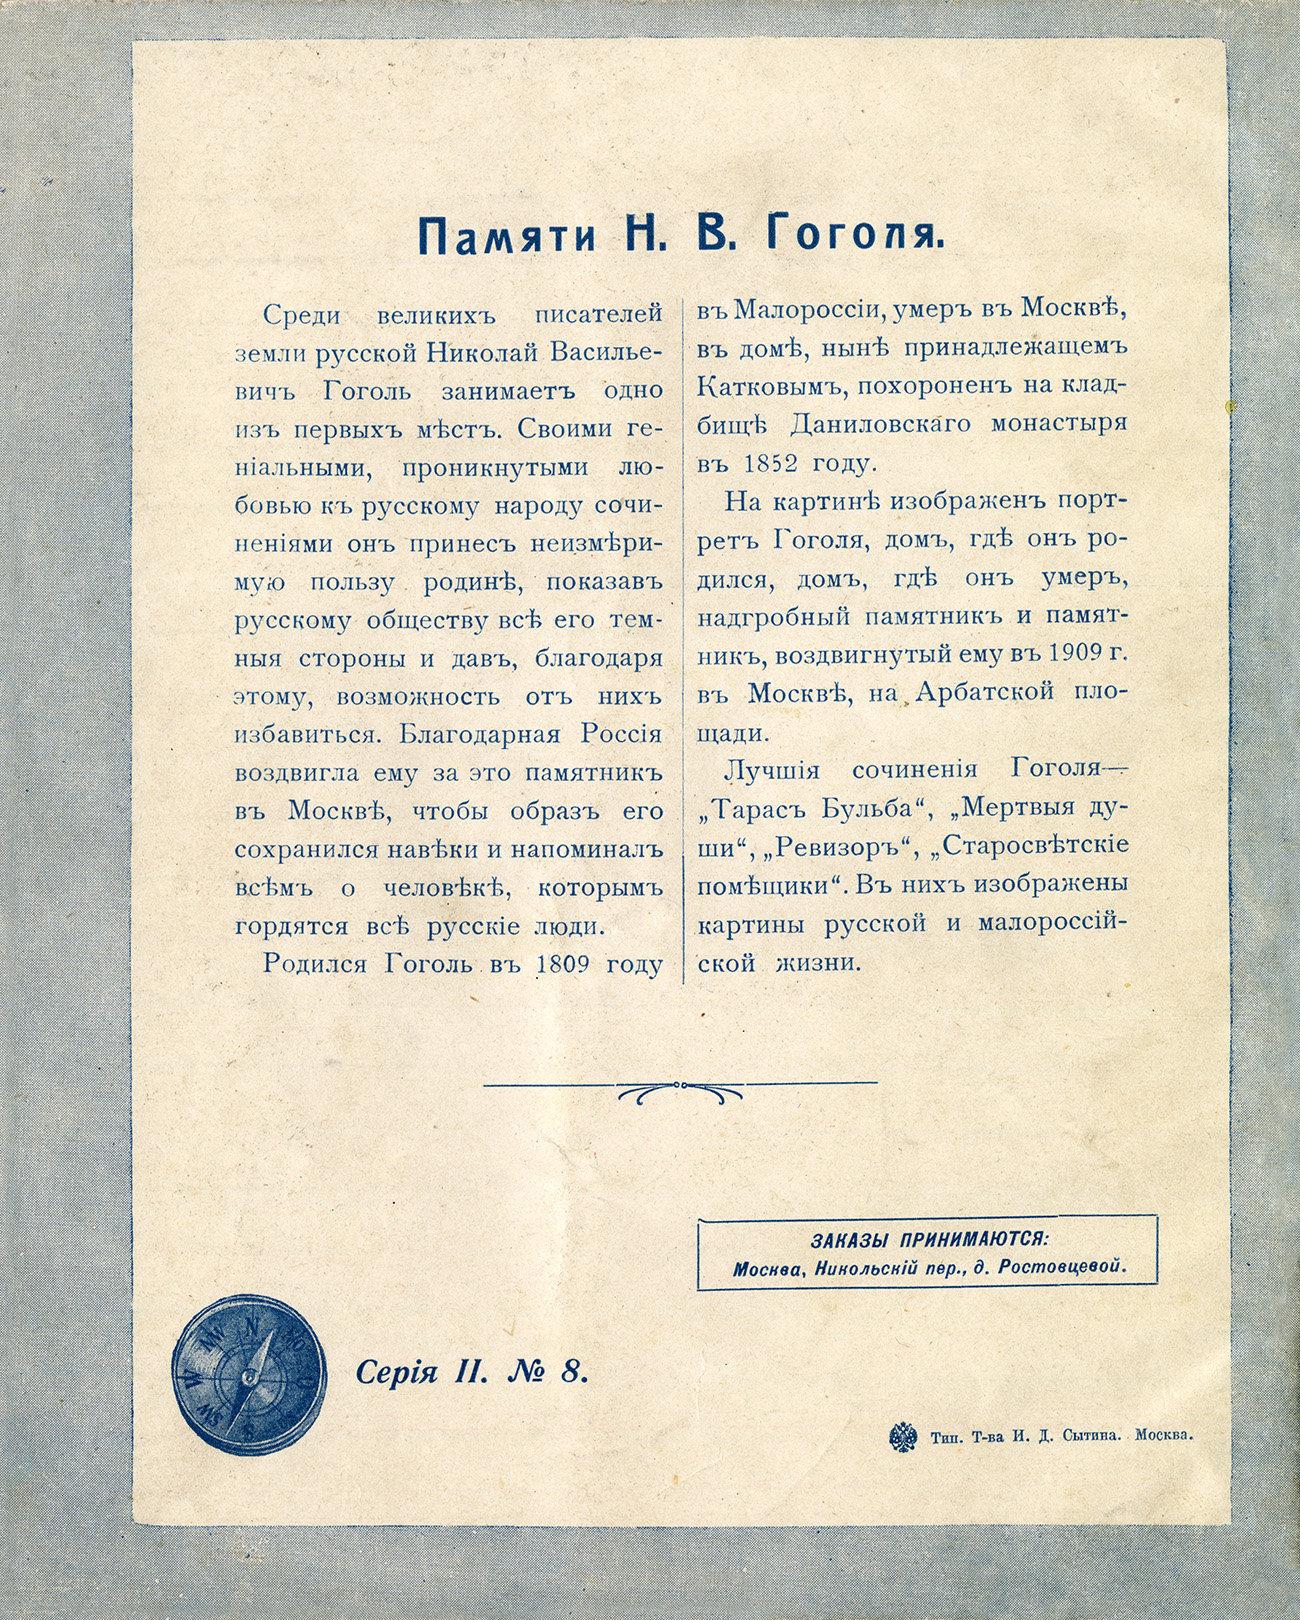 Тетрадь памяти Гоголя тип Сытина, оборот